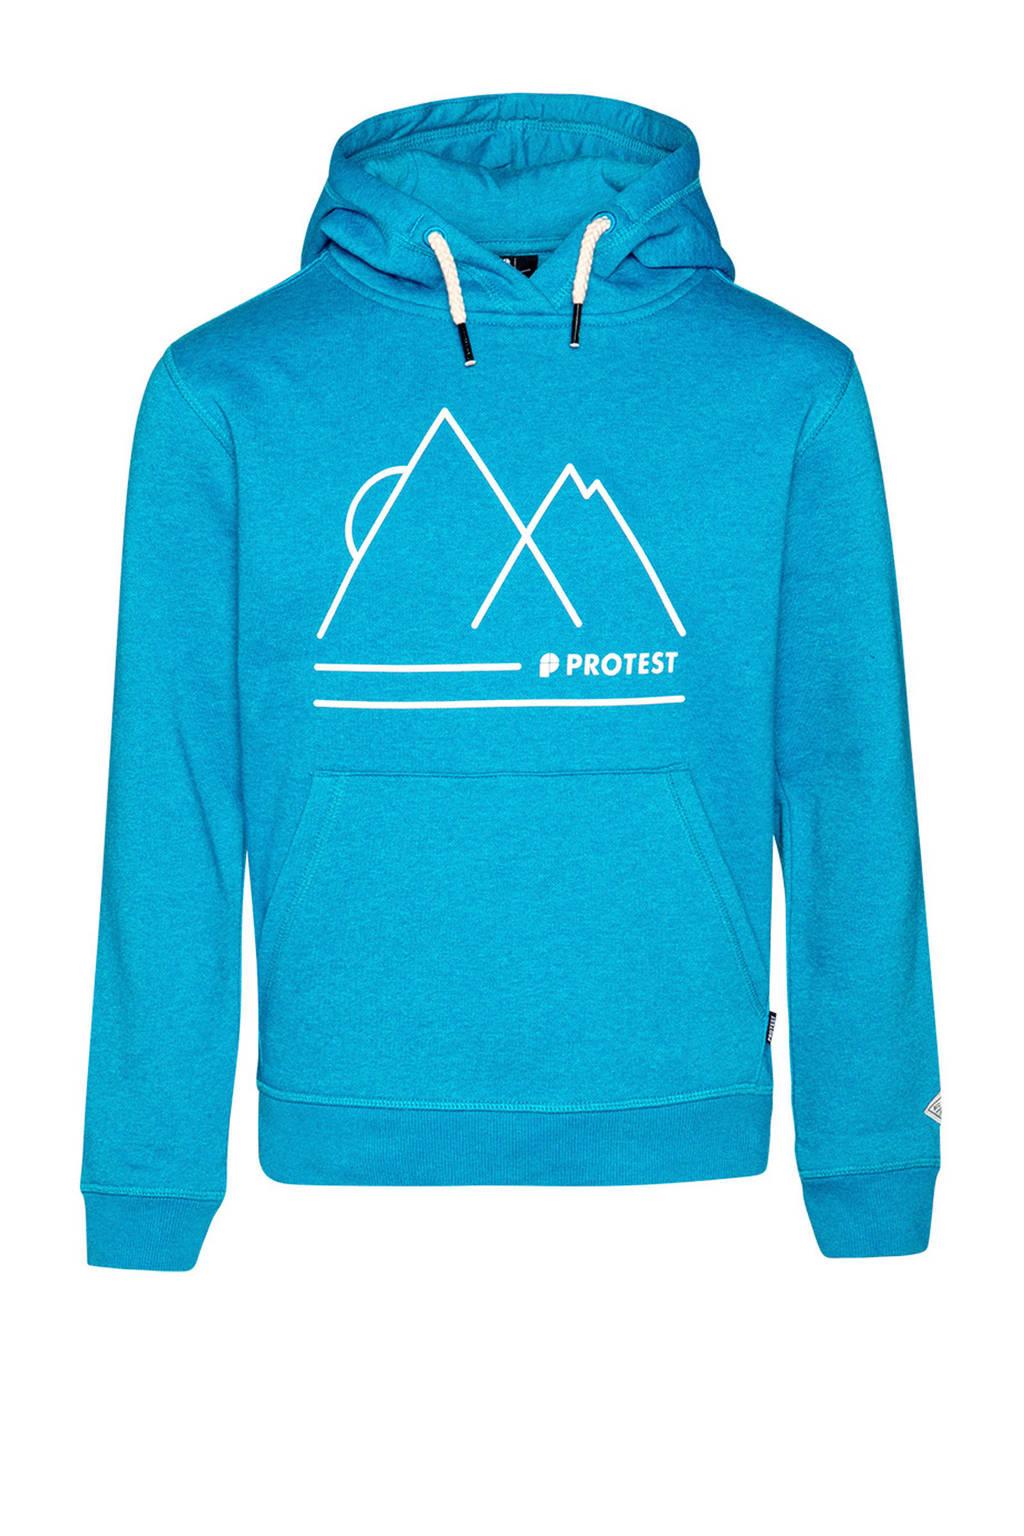 Protest hoodie blauw, Marlin Blue